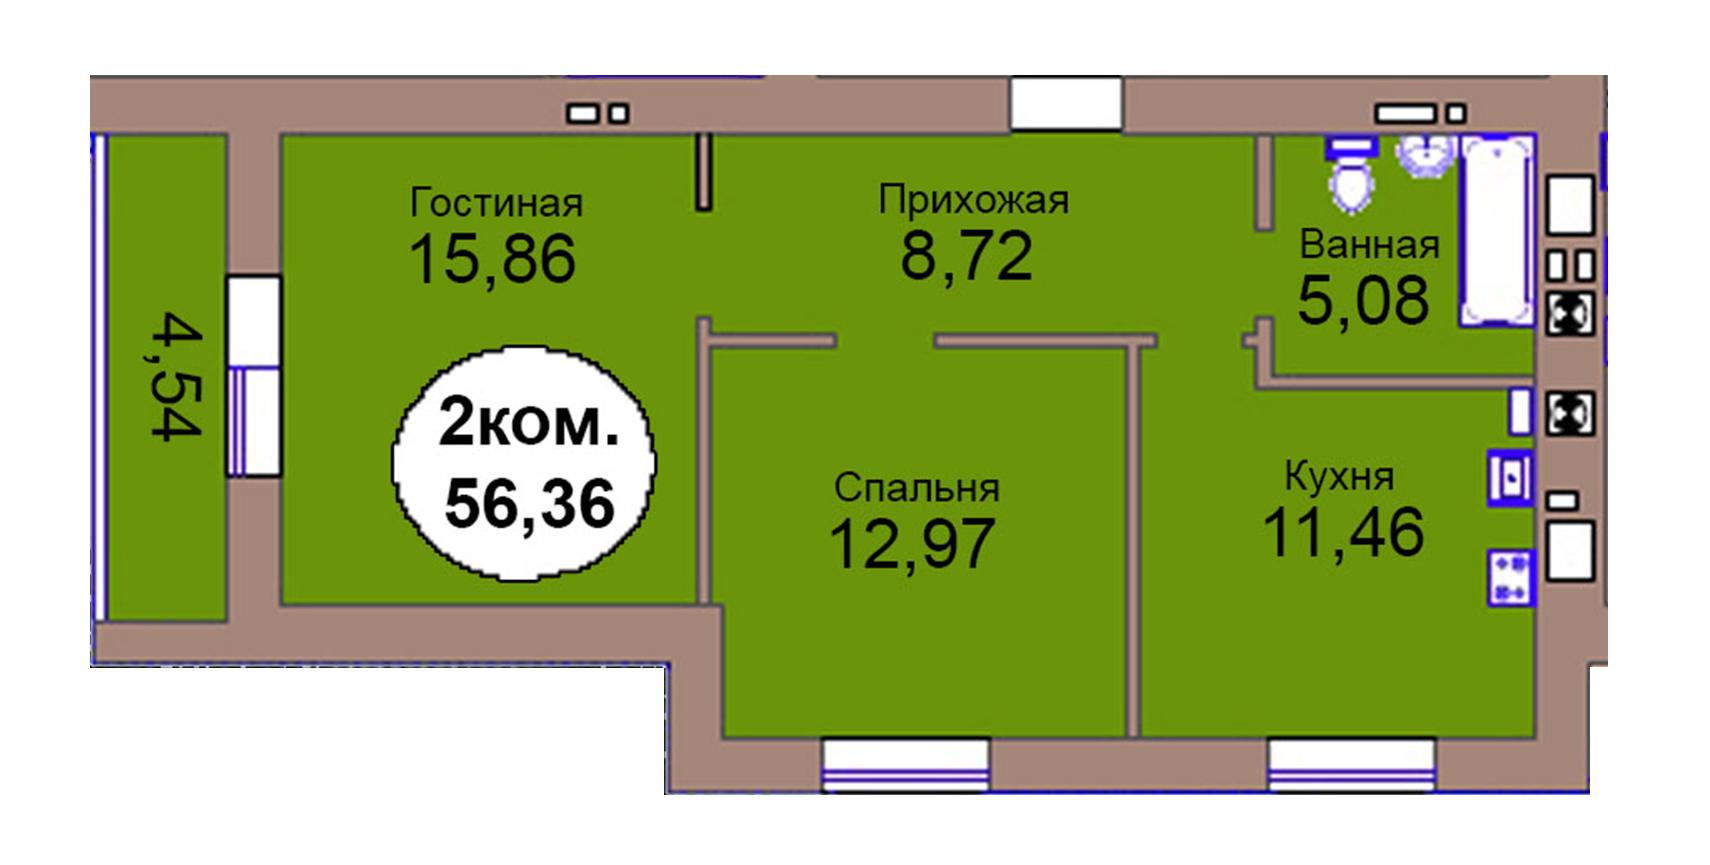 2-комн. кв. по пер. Калининградский, 4  кв. 74 в Калининграде